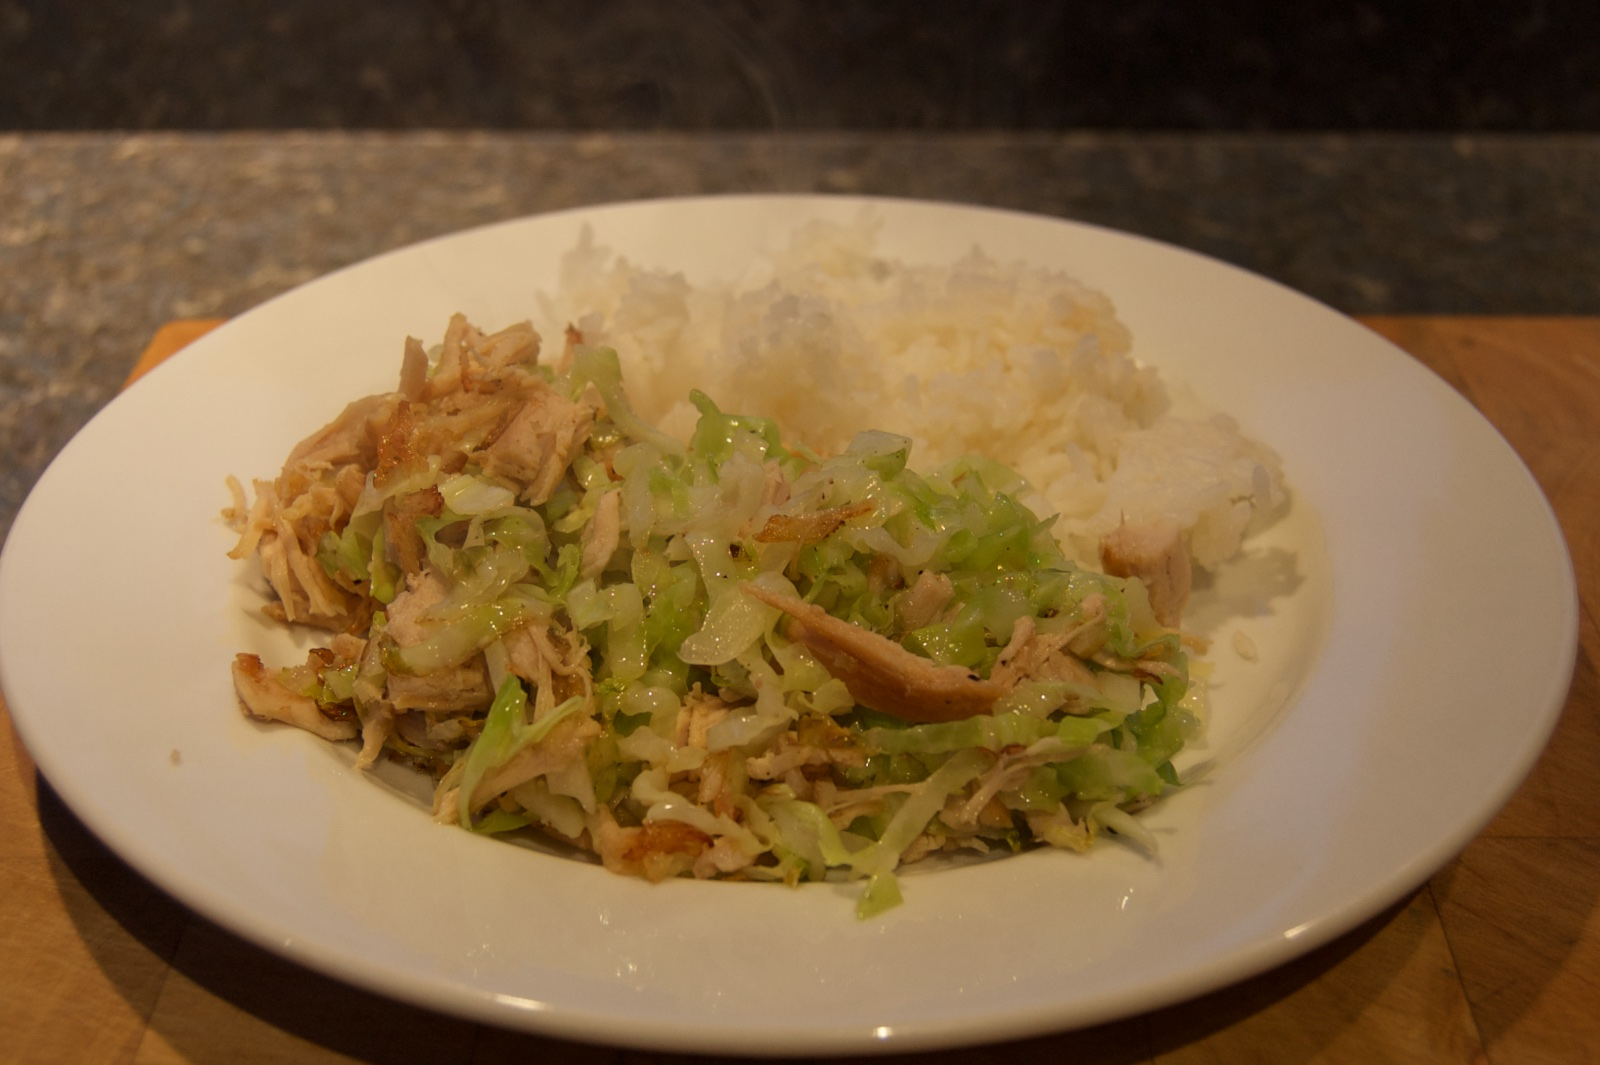 http://blog.rickk.com/food/2018/01/02/ate.2017.01.02.d.jpg